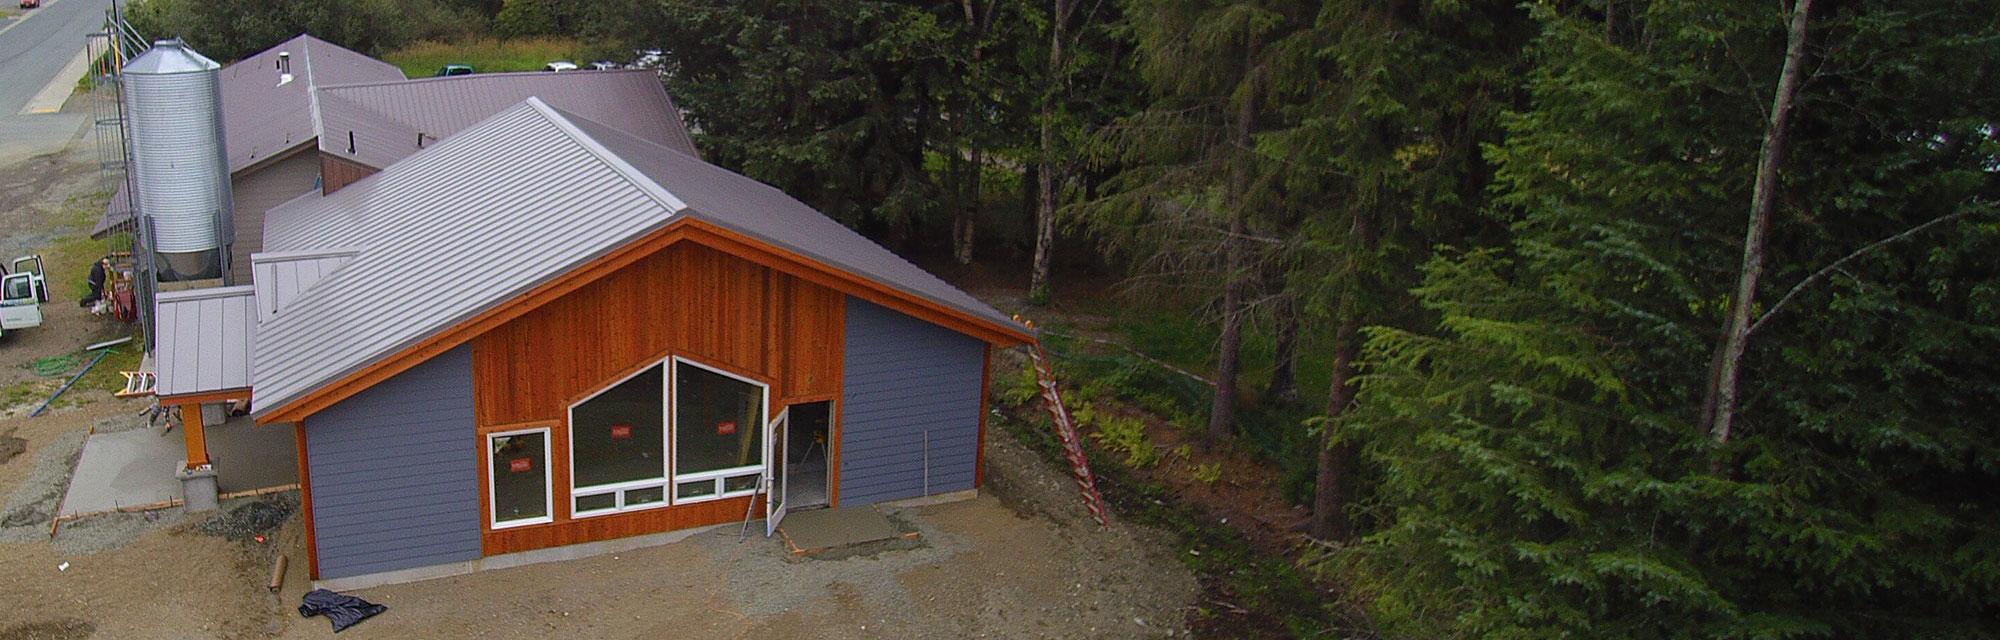 Chilkat Valley Preschool / Haines, AK